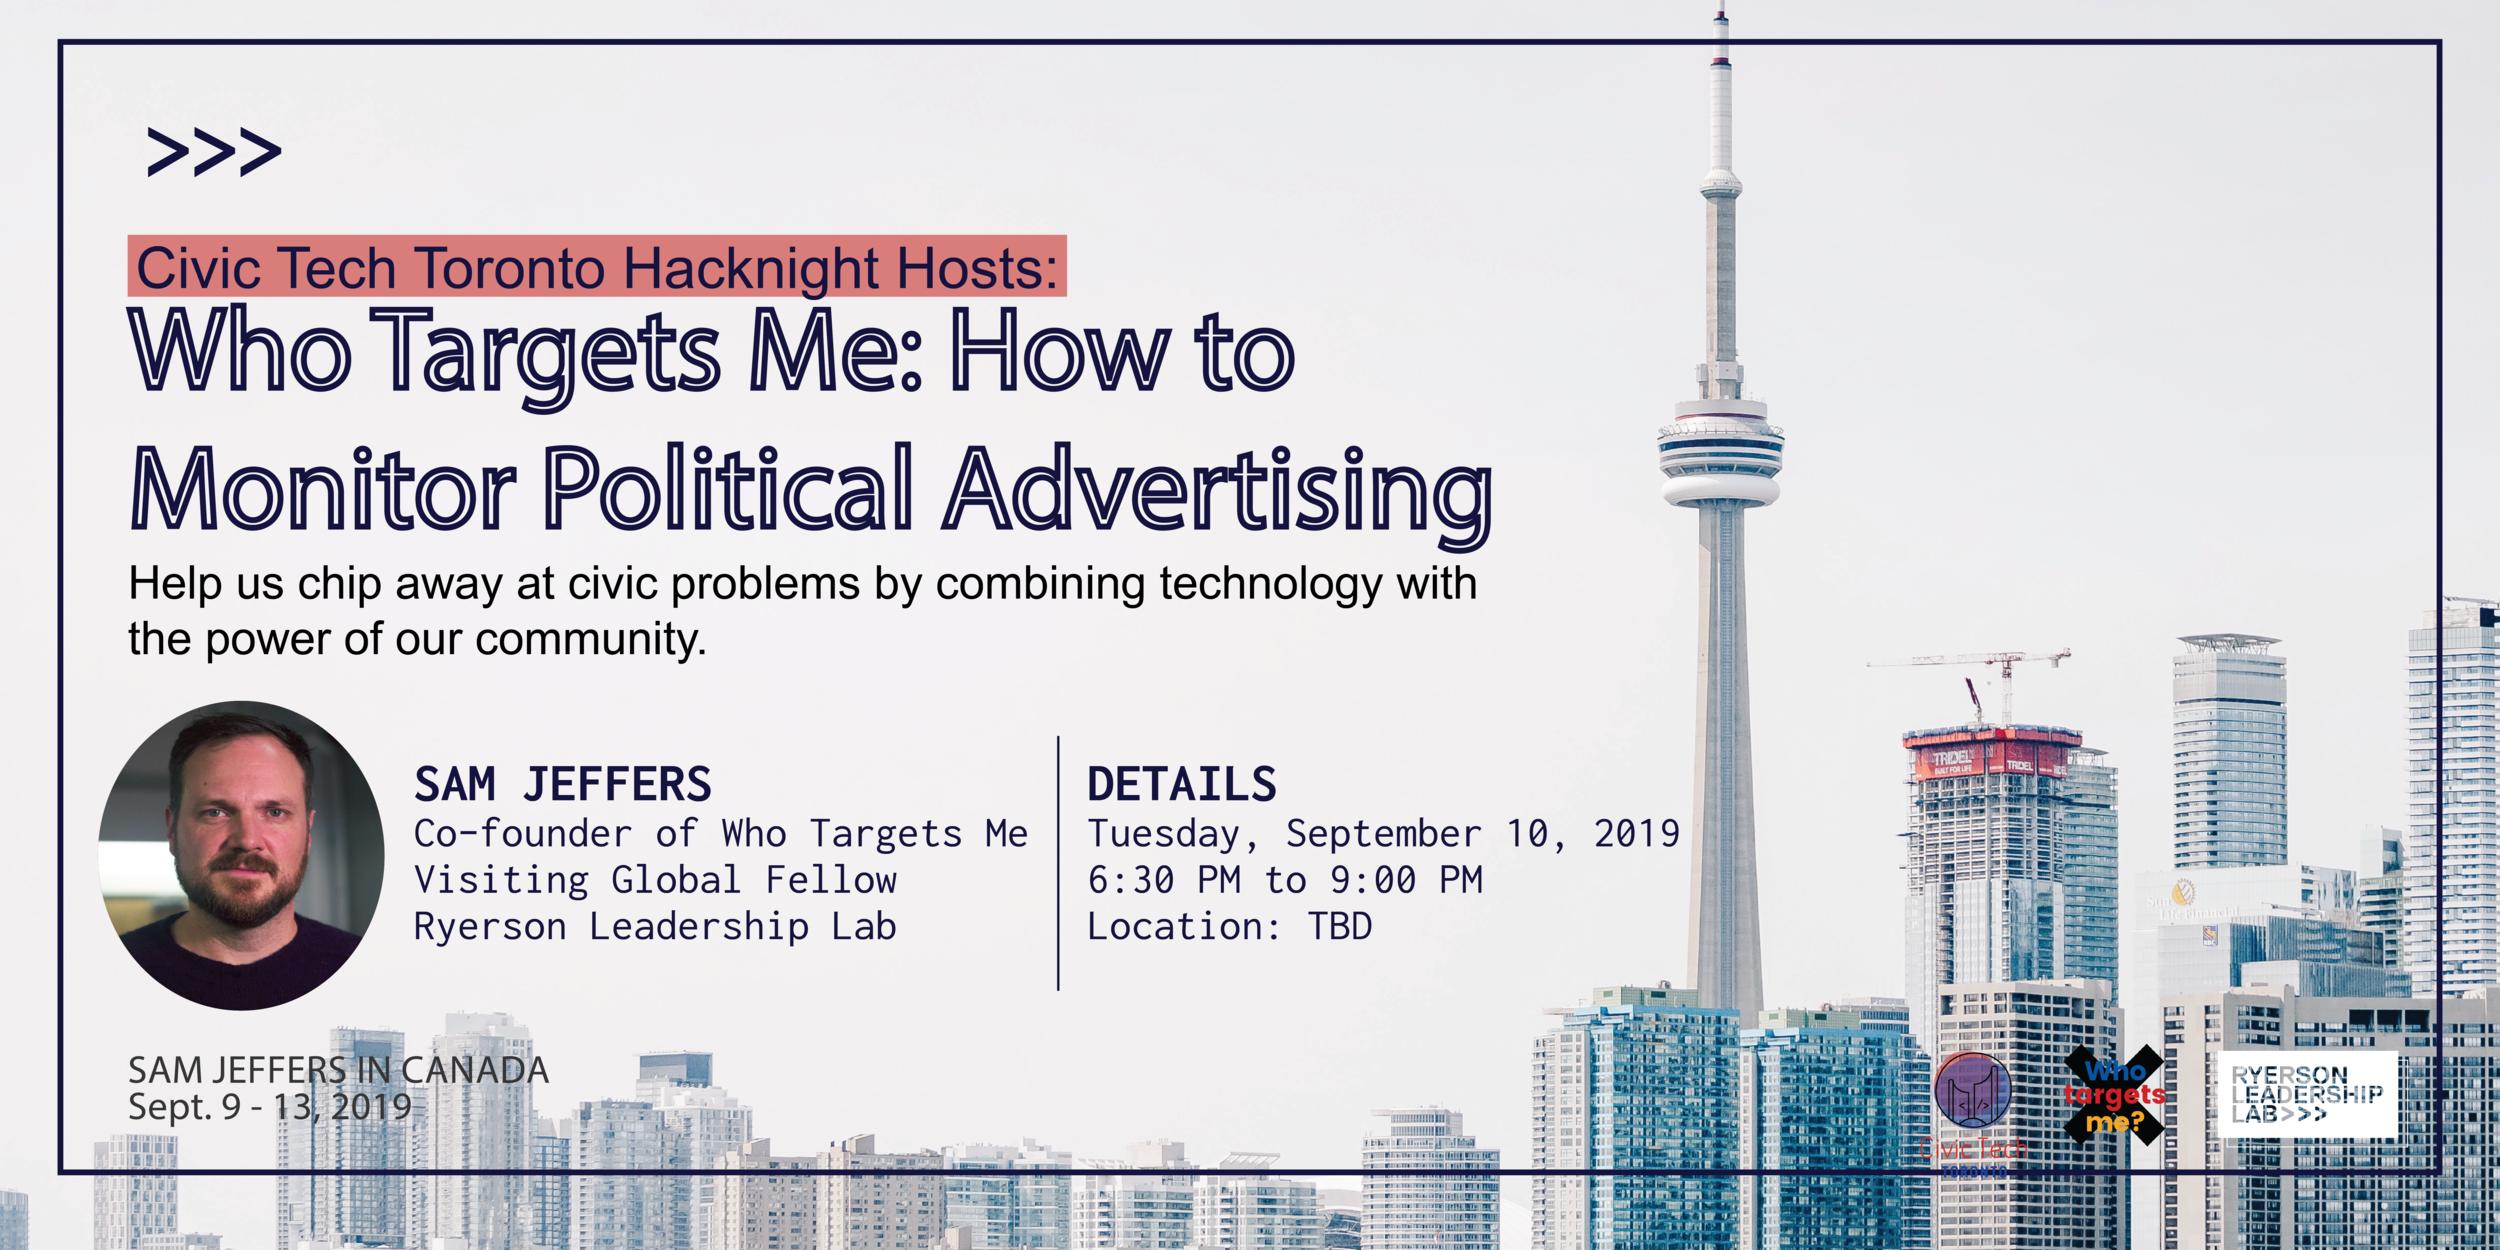 Civic Tech Toronto Hacknight-Final-02.png